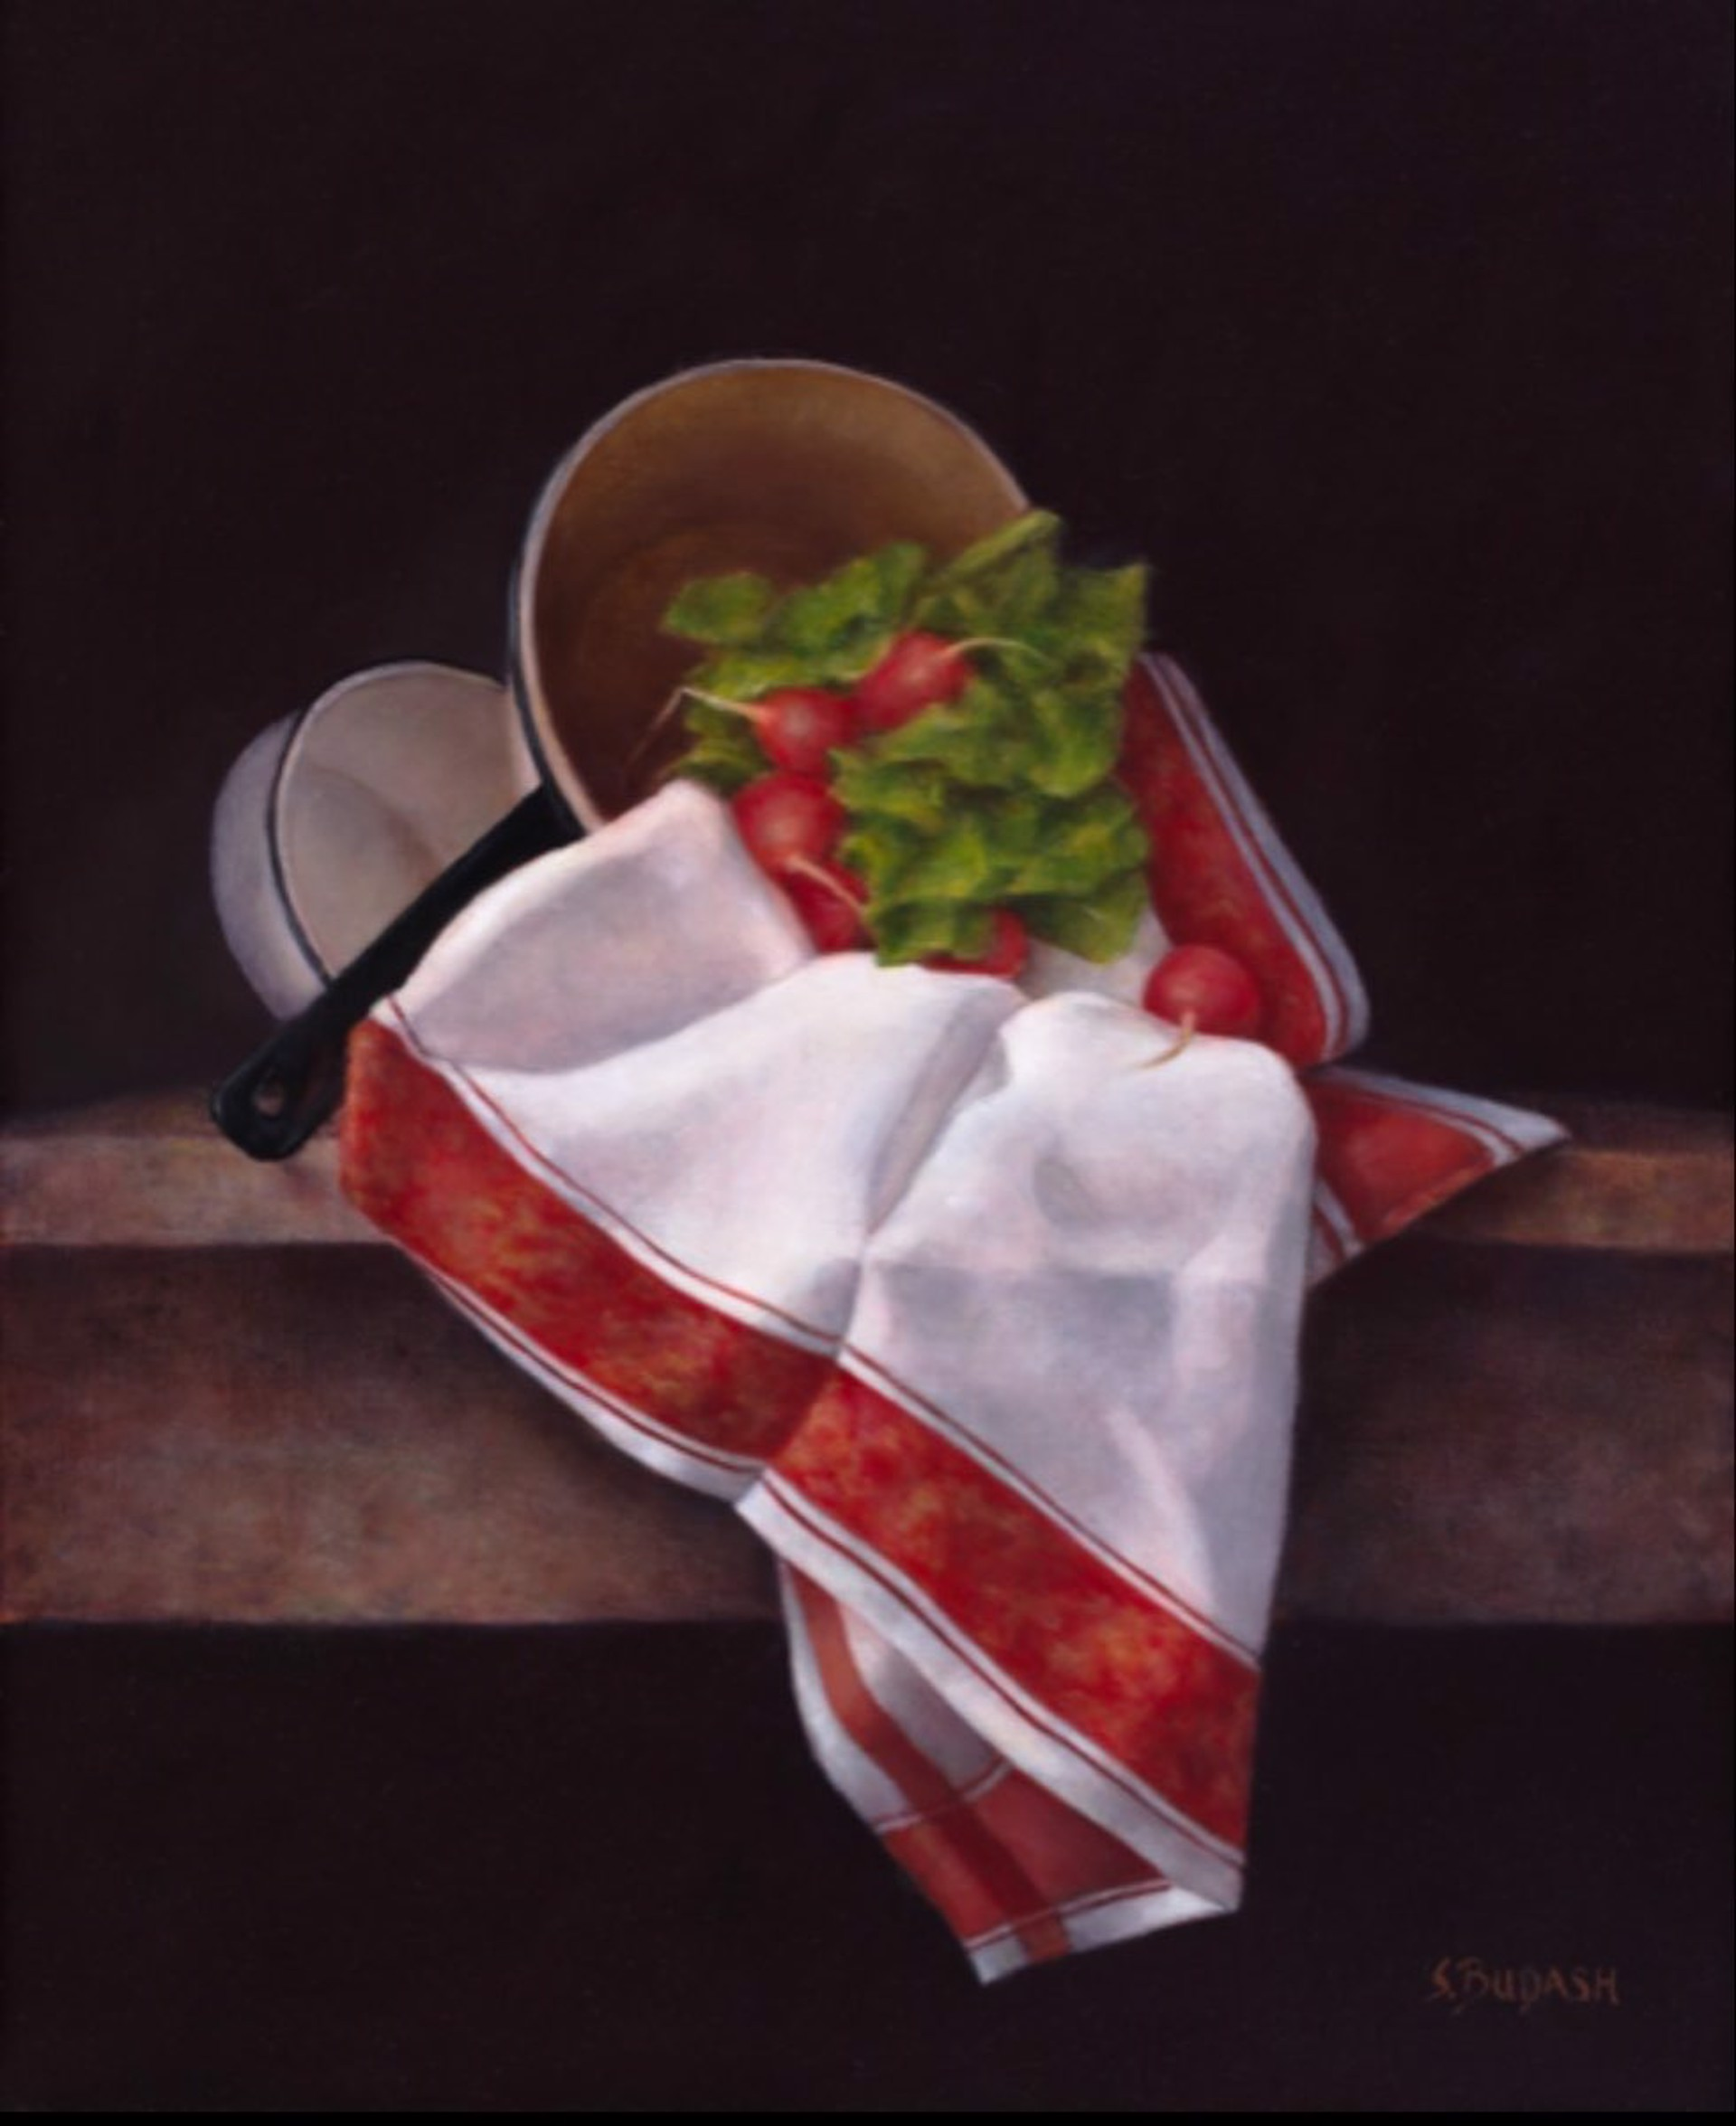 Fandango In Red by Susan Budash